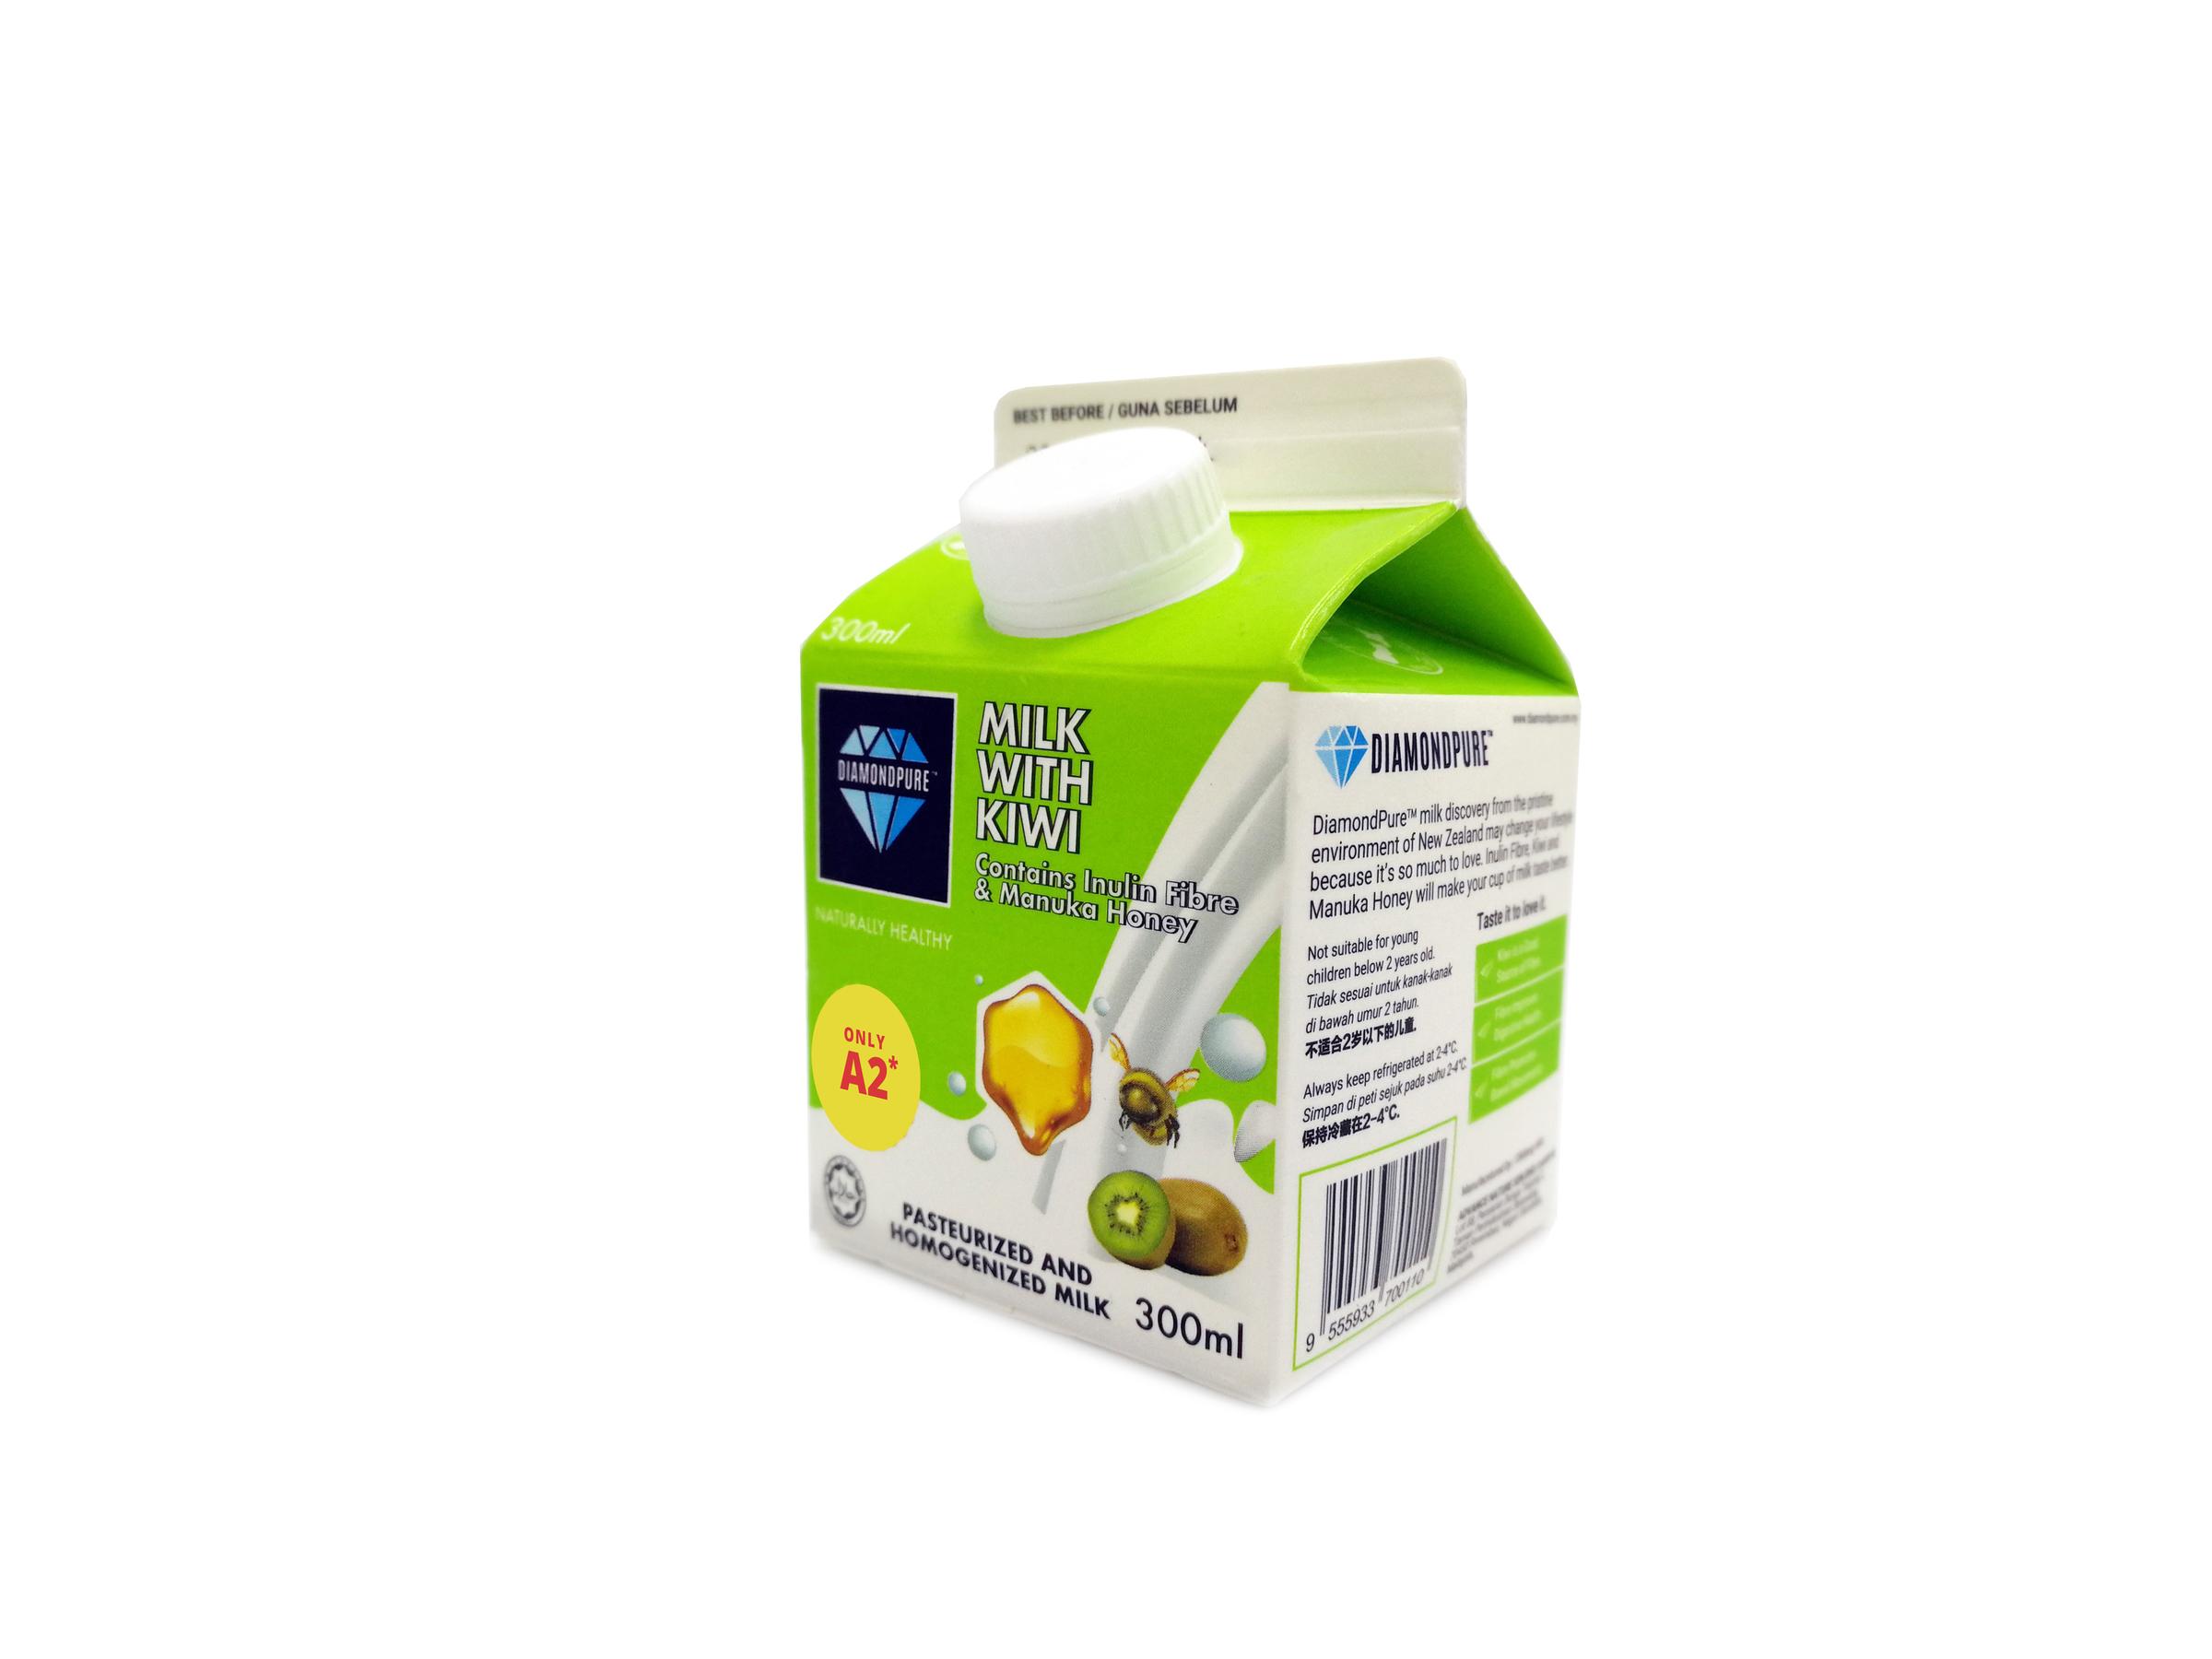 Diamond Pure-Milk With Kiwi & Manuka Honey (300ml) *(Outstation N/A; 外州送不到)